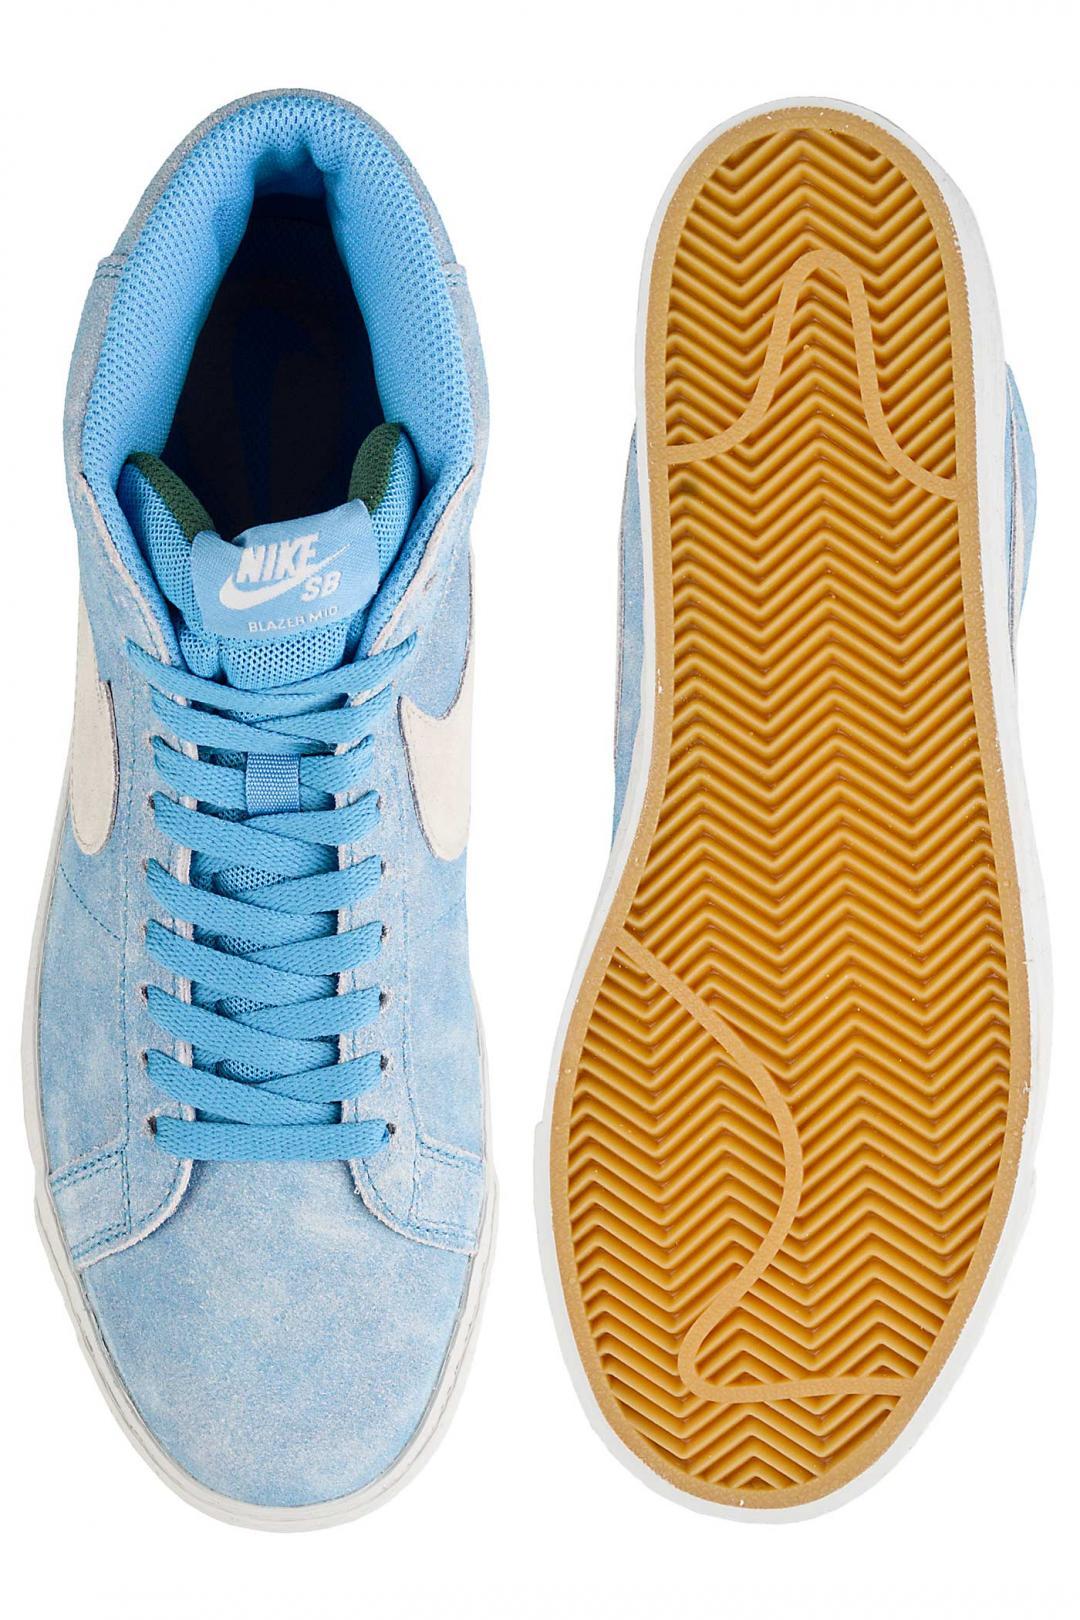 Uomo Nike SB x Lance Mountain Zoom Blazer Mid university blue light bone | Sneakers mid top